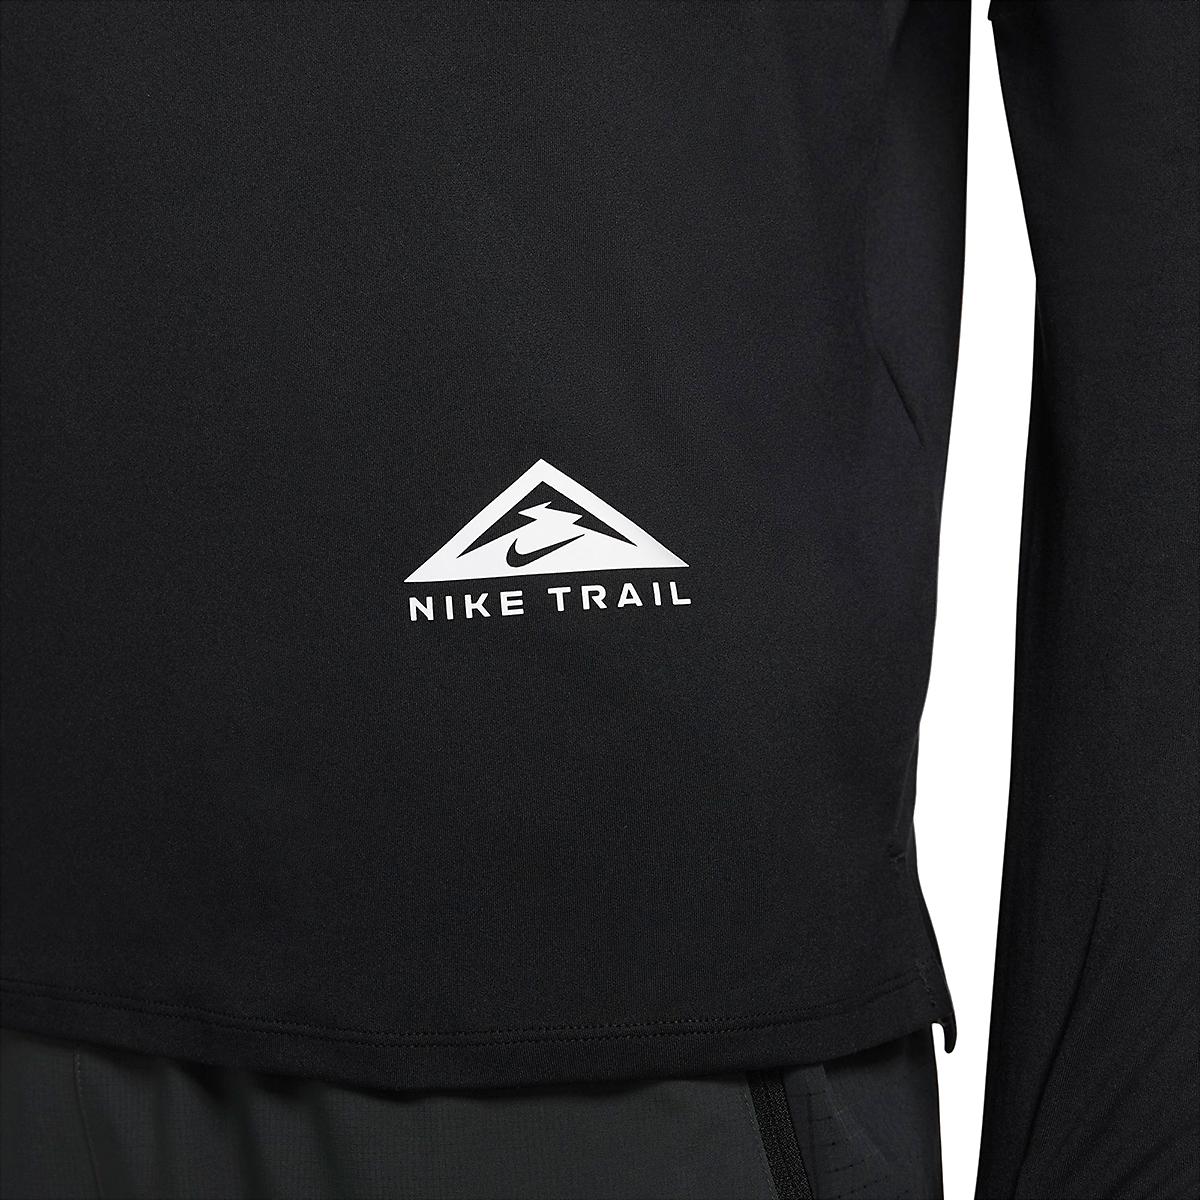 Men's Nike Dri-FIT Element 1/2-Zip Trail Running Top - Color: Black/Black/Dark Smoke Grey/White - Size: XS, Black/Black/Dark Smoke Grey/White, large, image 4